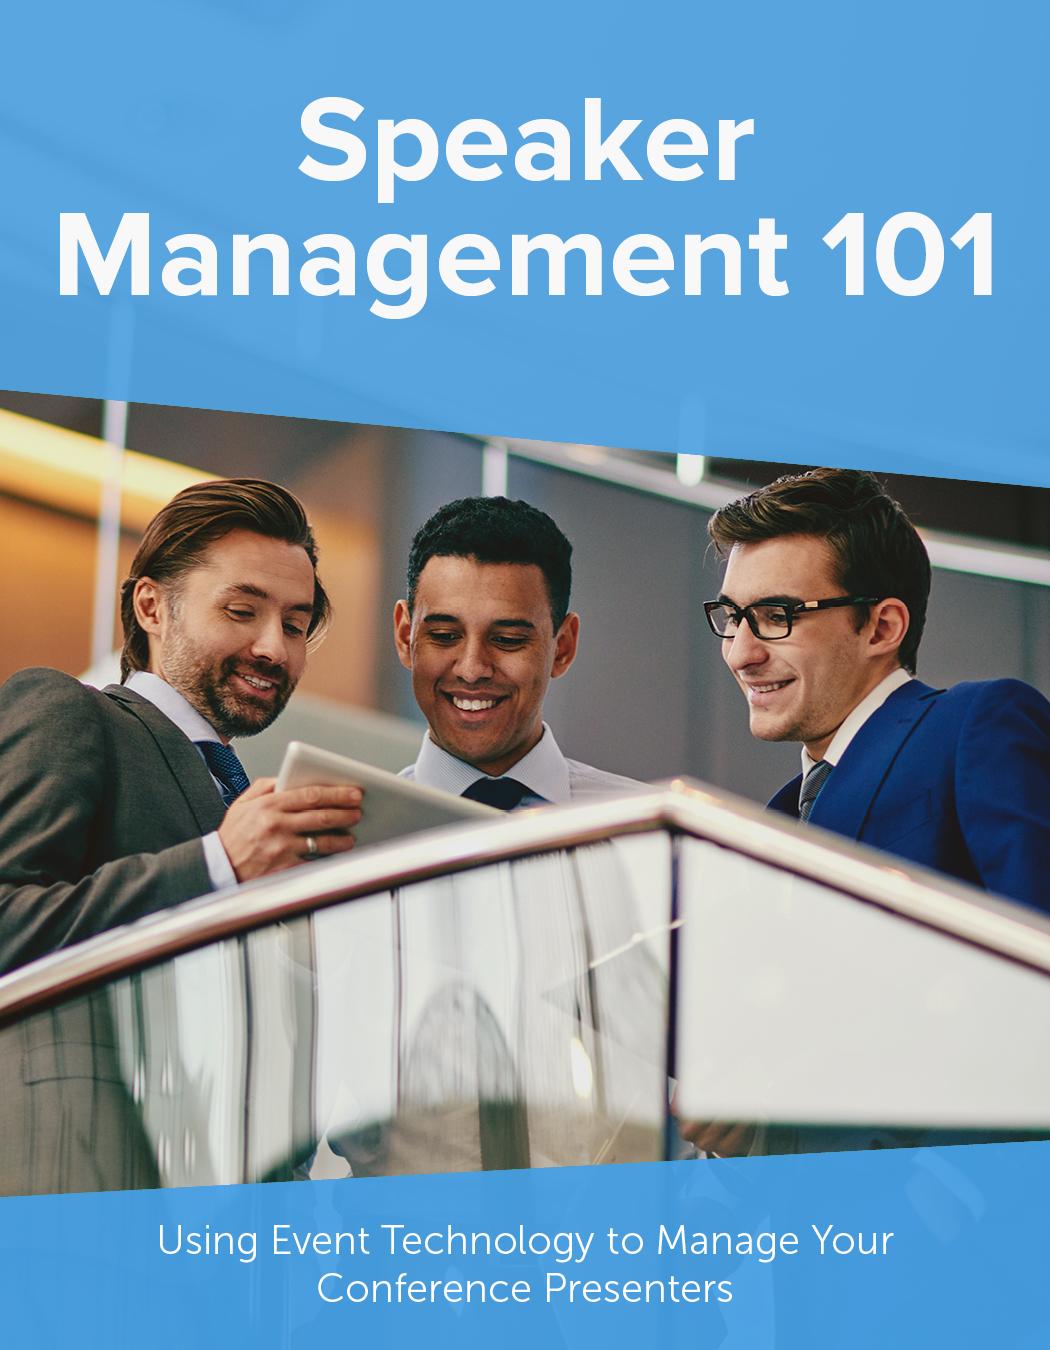 Speaker Management 101